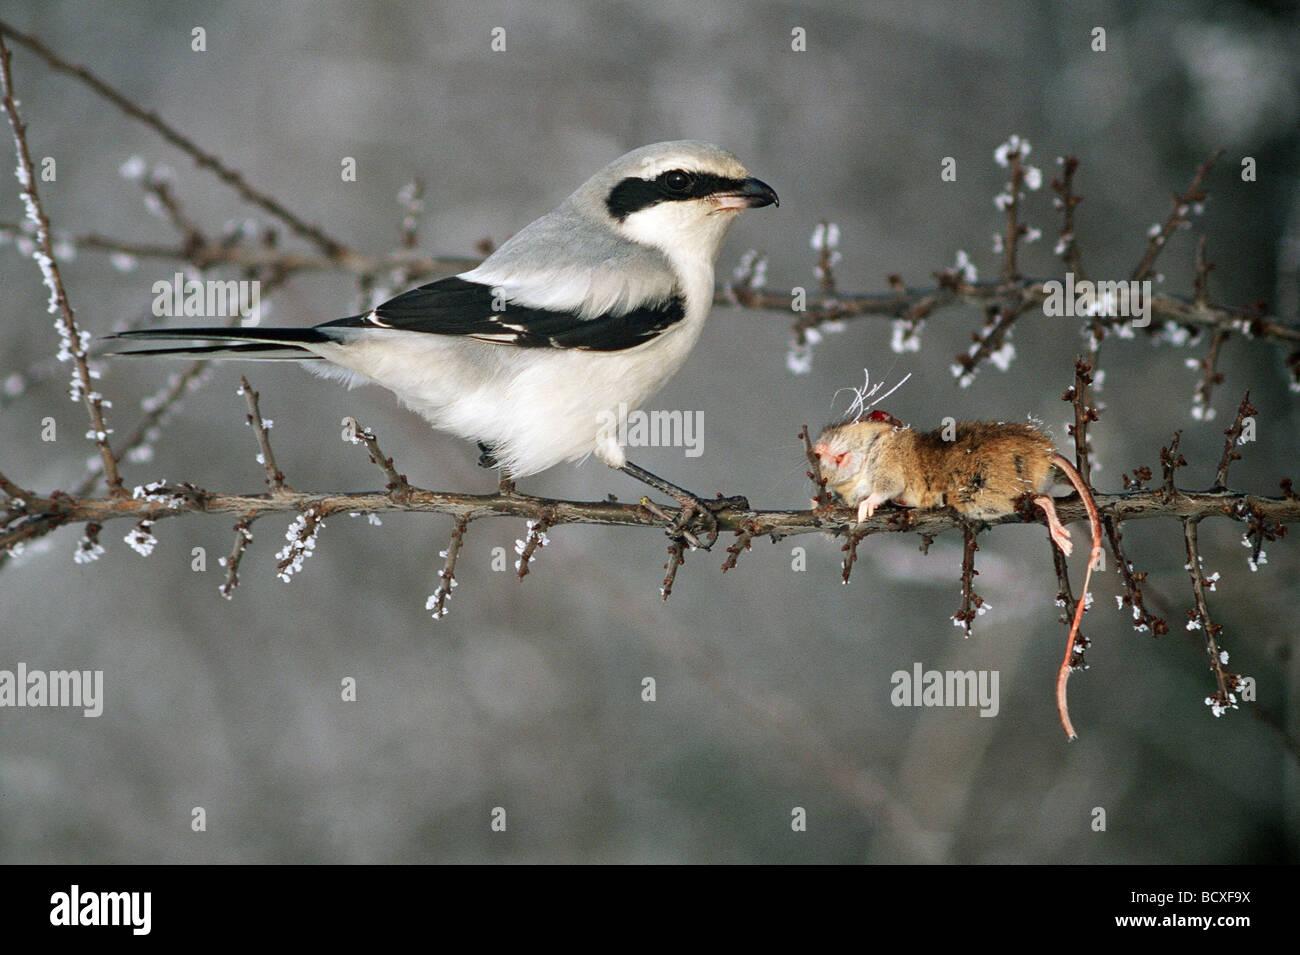 Great grey shrike - Wikipedia